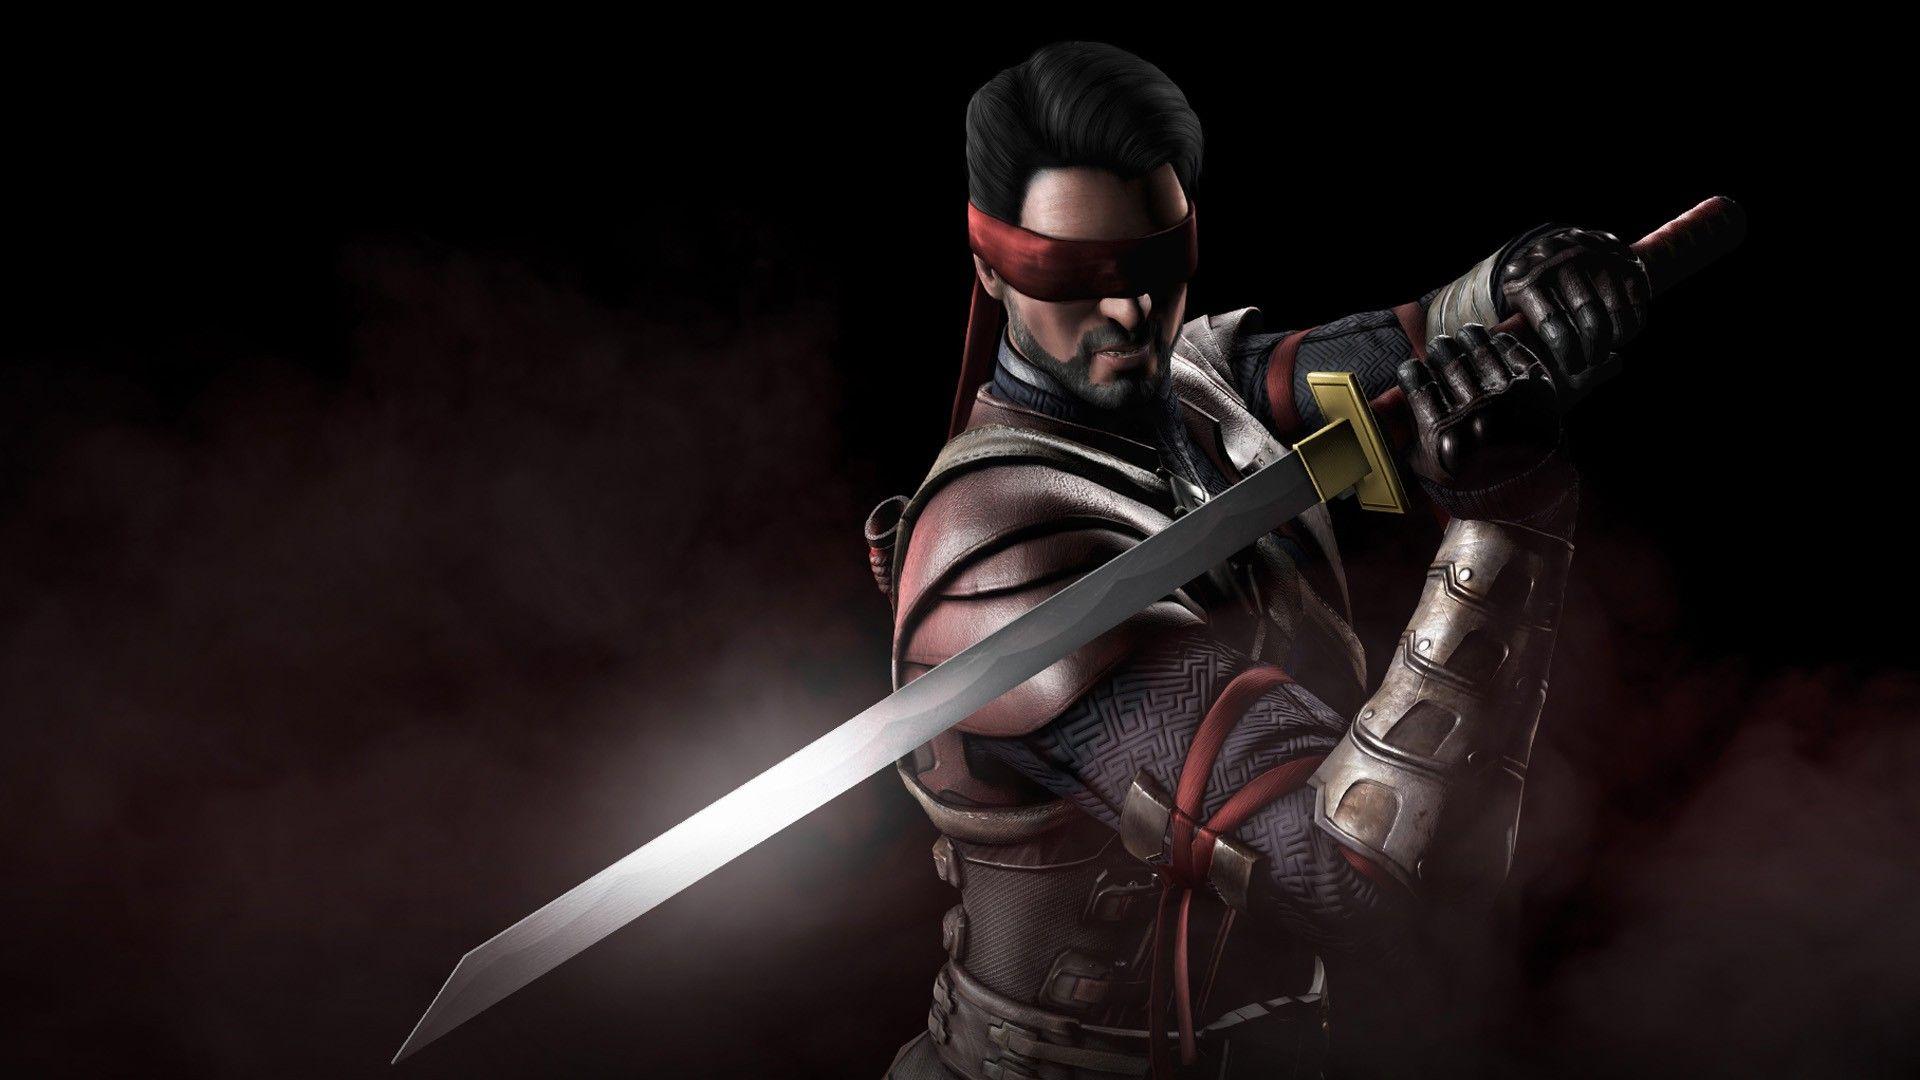 kenshi-wallpapers-free   Mortal Kombat X   Мортал комбат, Стиль и Игры